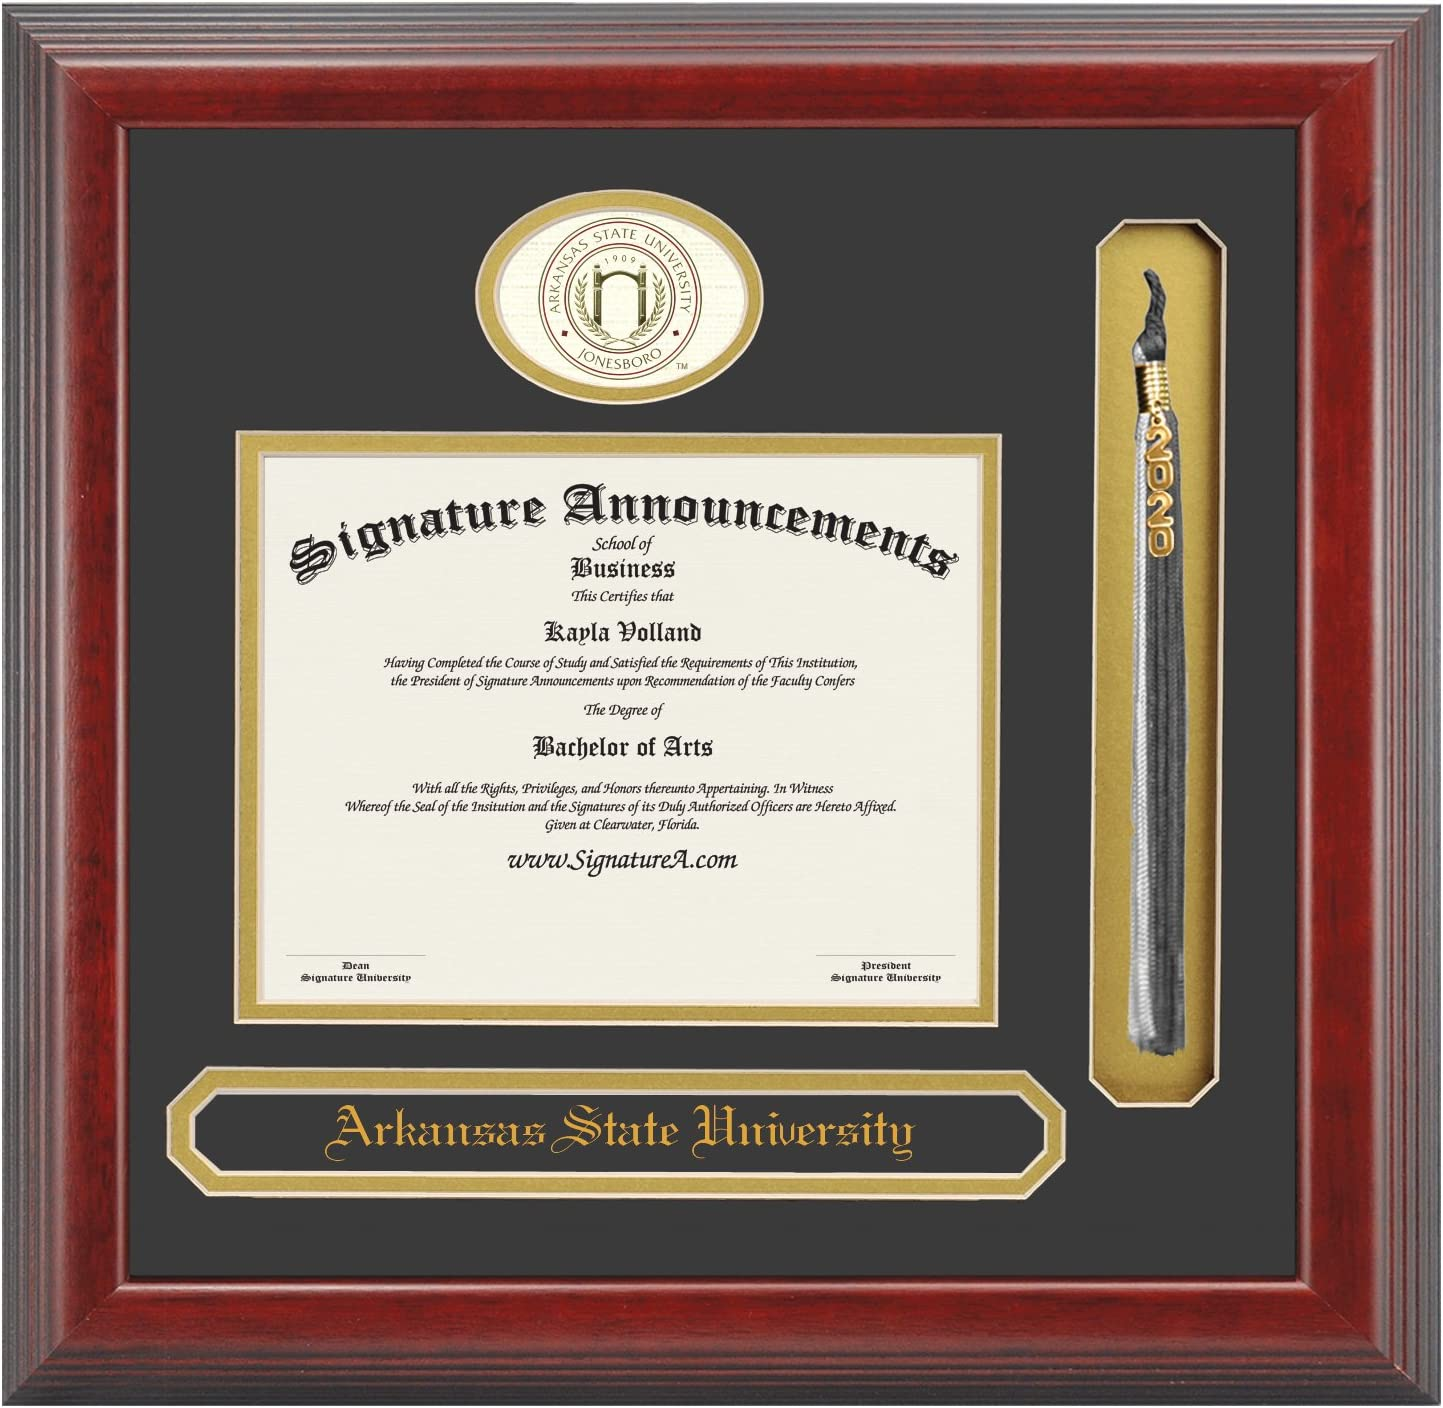 Signature Announcements outlet Arkansas Inexpensive State ASU Undergra University